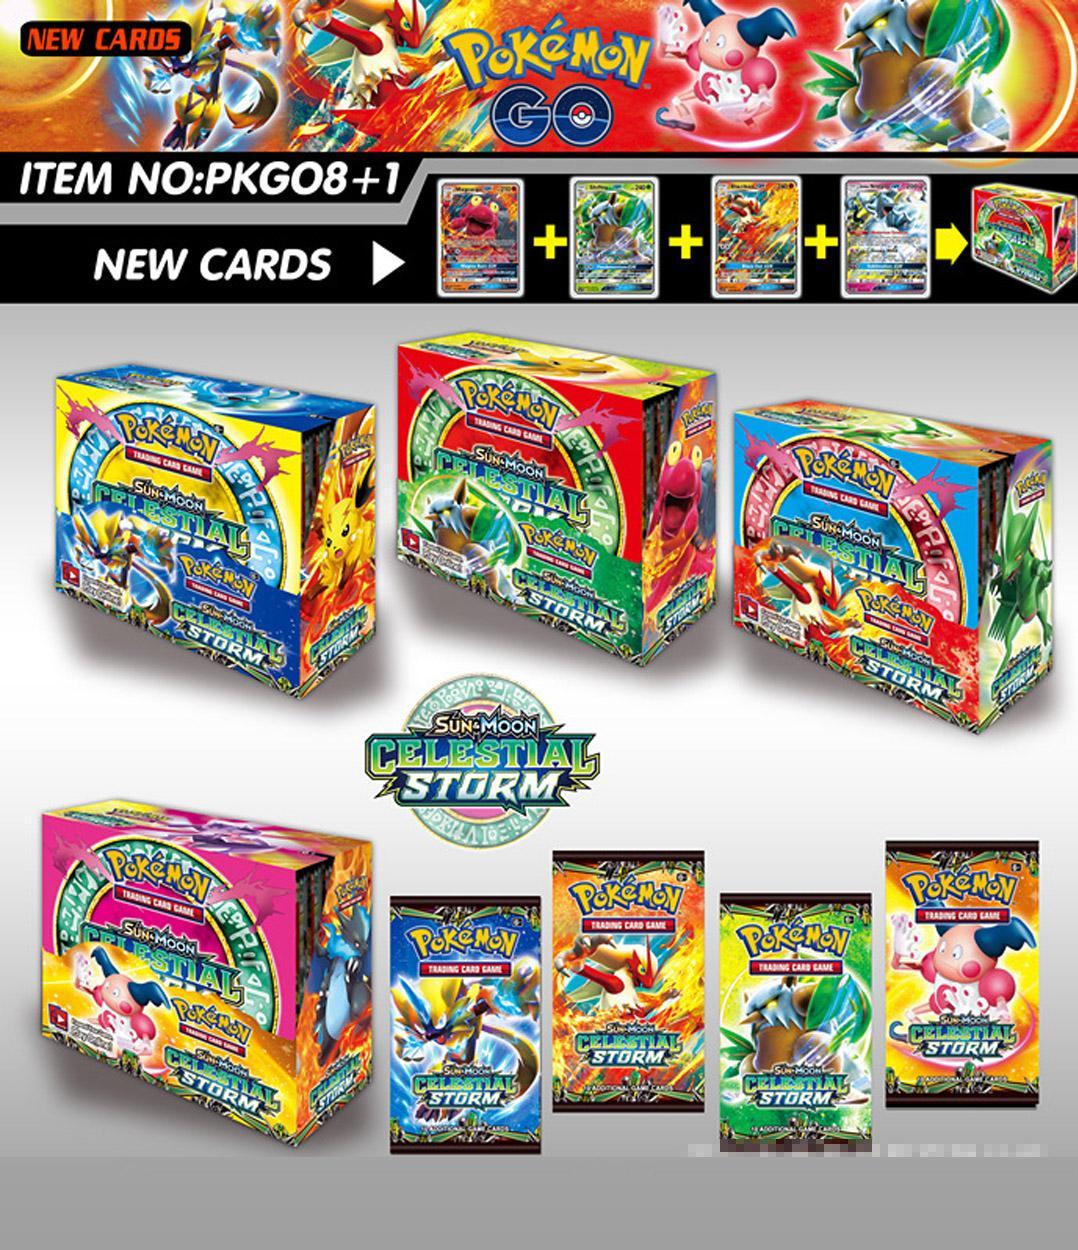 takara-tomy-324pcs-box-sun-moon-gx-mega-font-b-pokemon-b-font-shining-cards-game-battle-game-children-toy